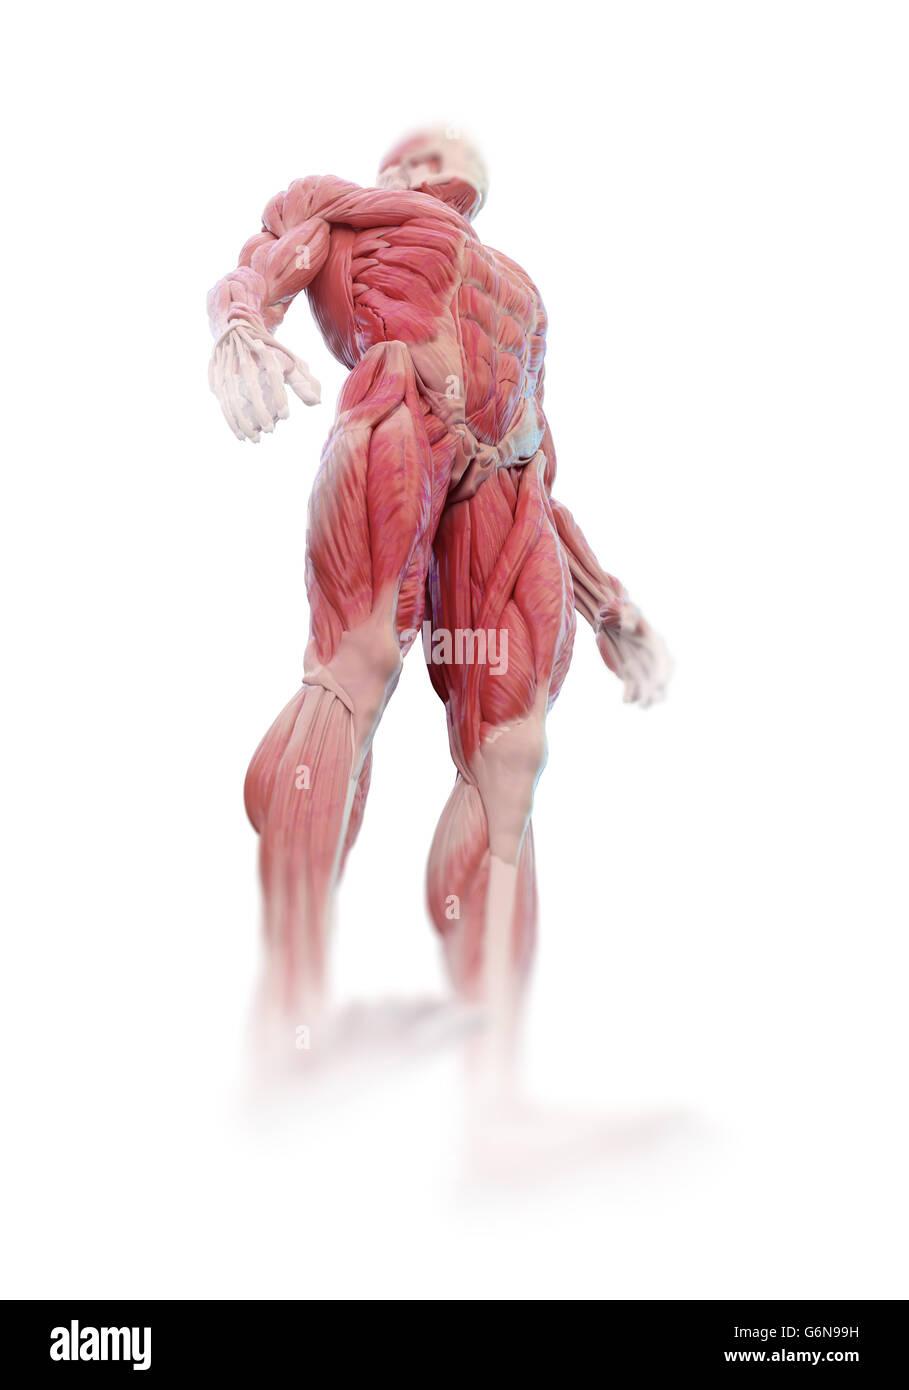 Detailed muscle human anatomy illustration - Stock Image